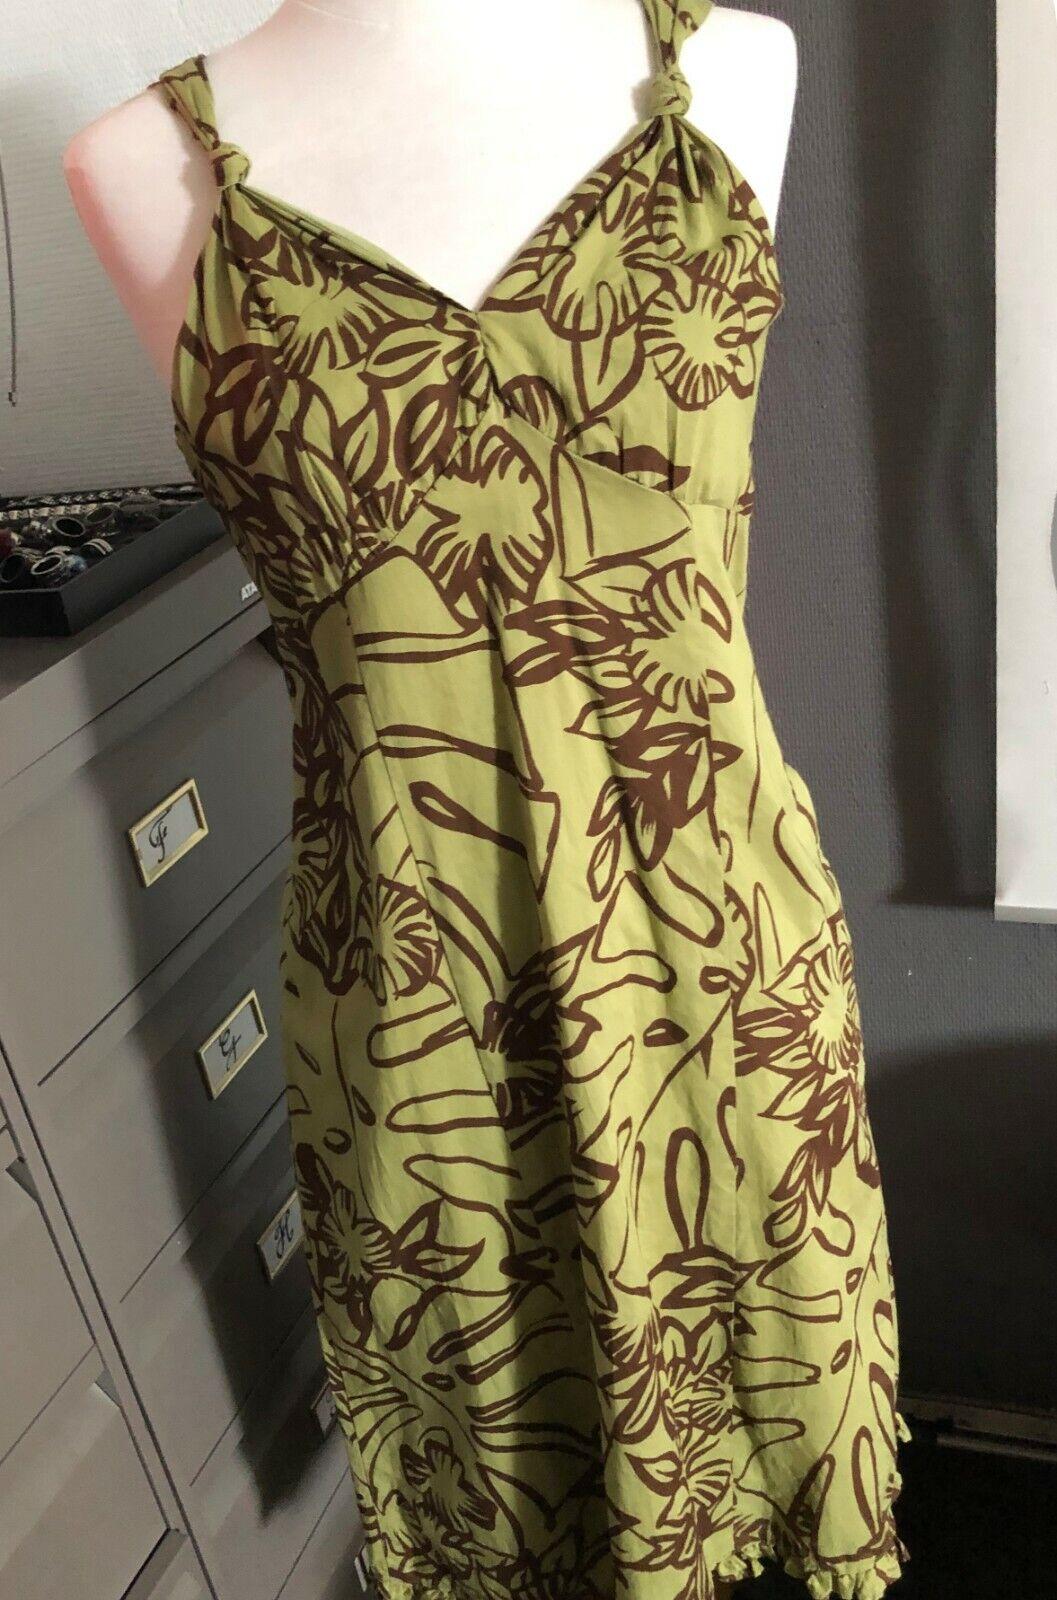 Sublime robe  de la marque GUY LAROCHE